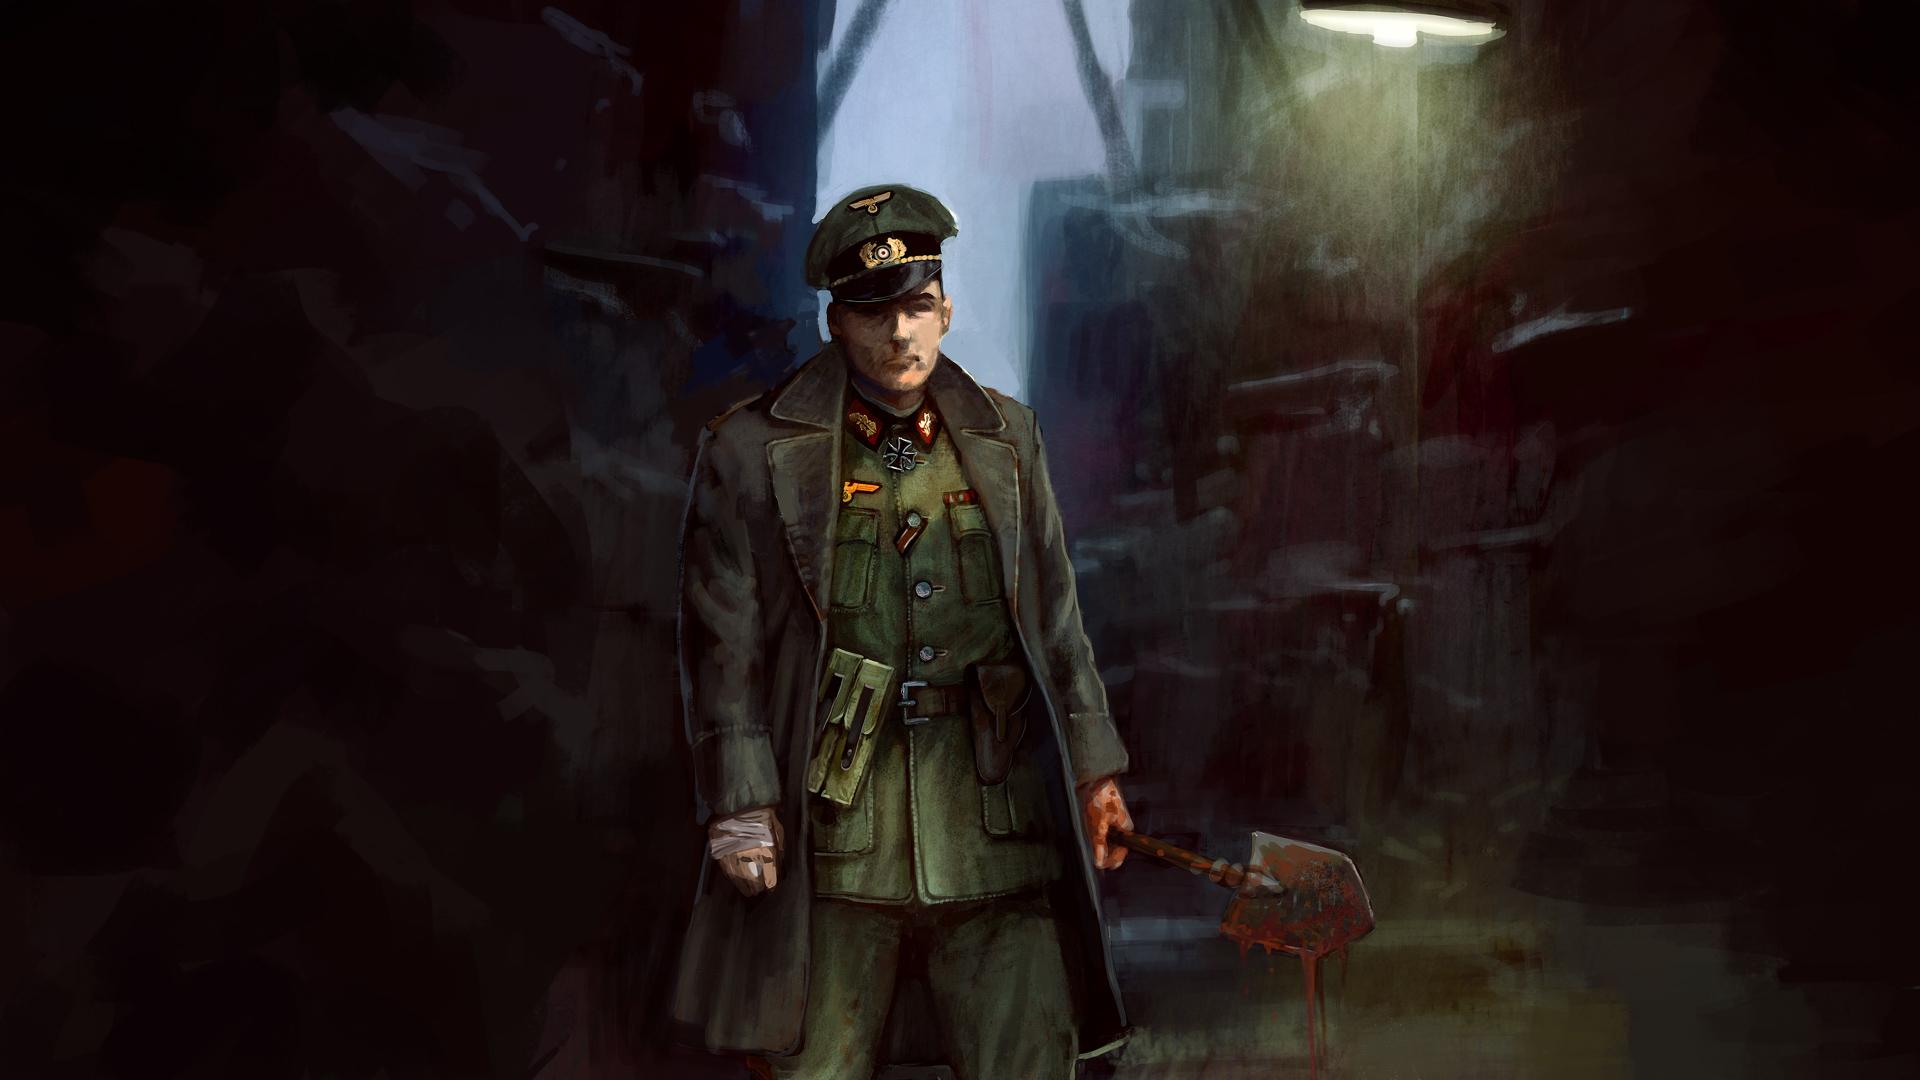 German scout public street casting fuck for jarushka ross - 3 part 9